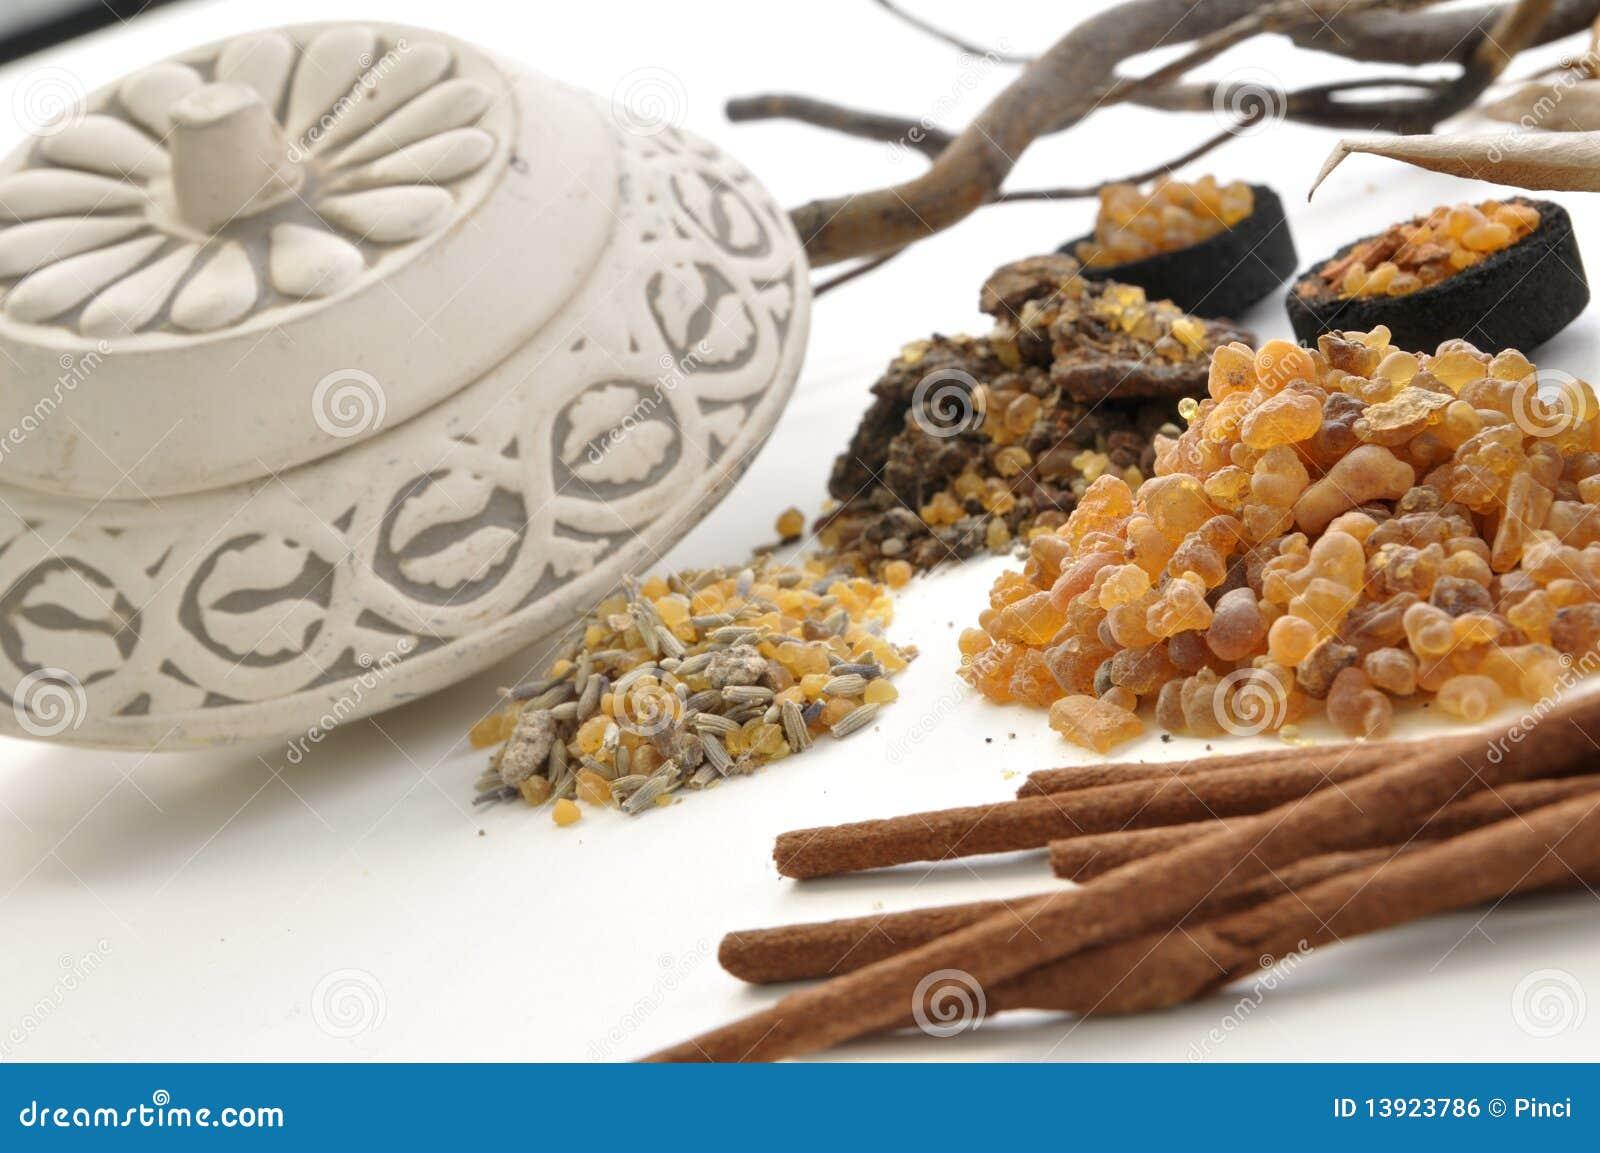 Objetos para o ritual